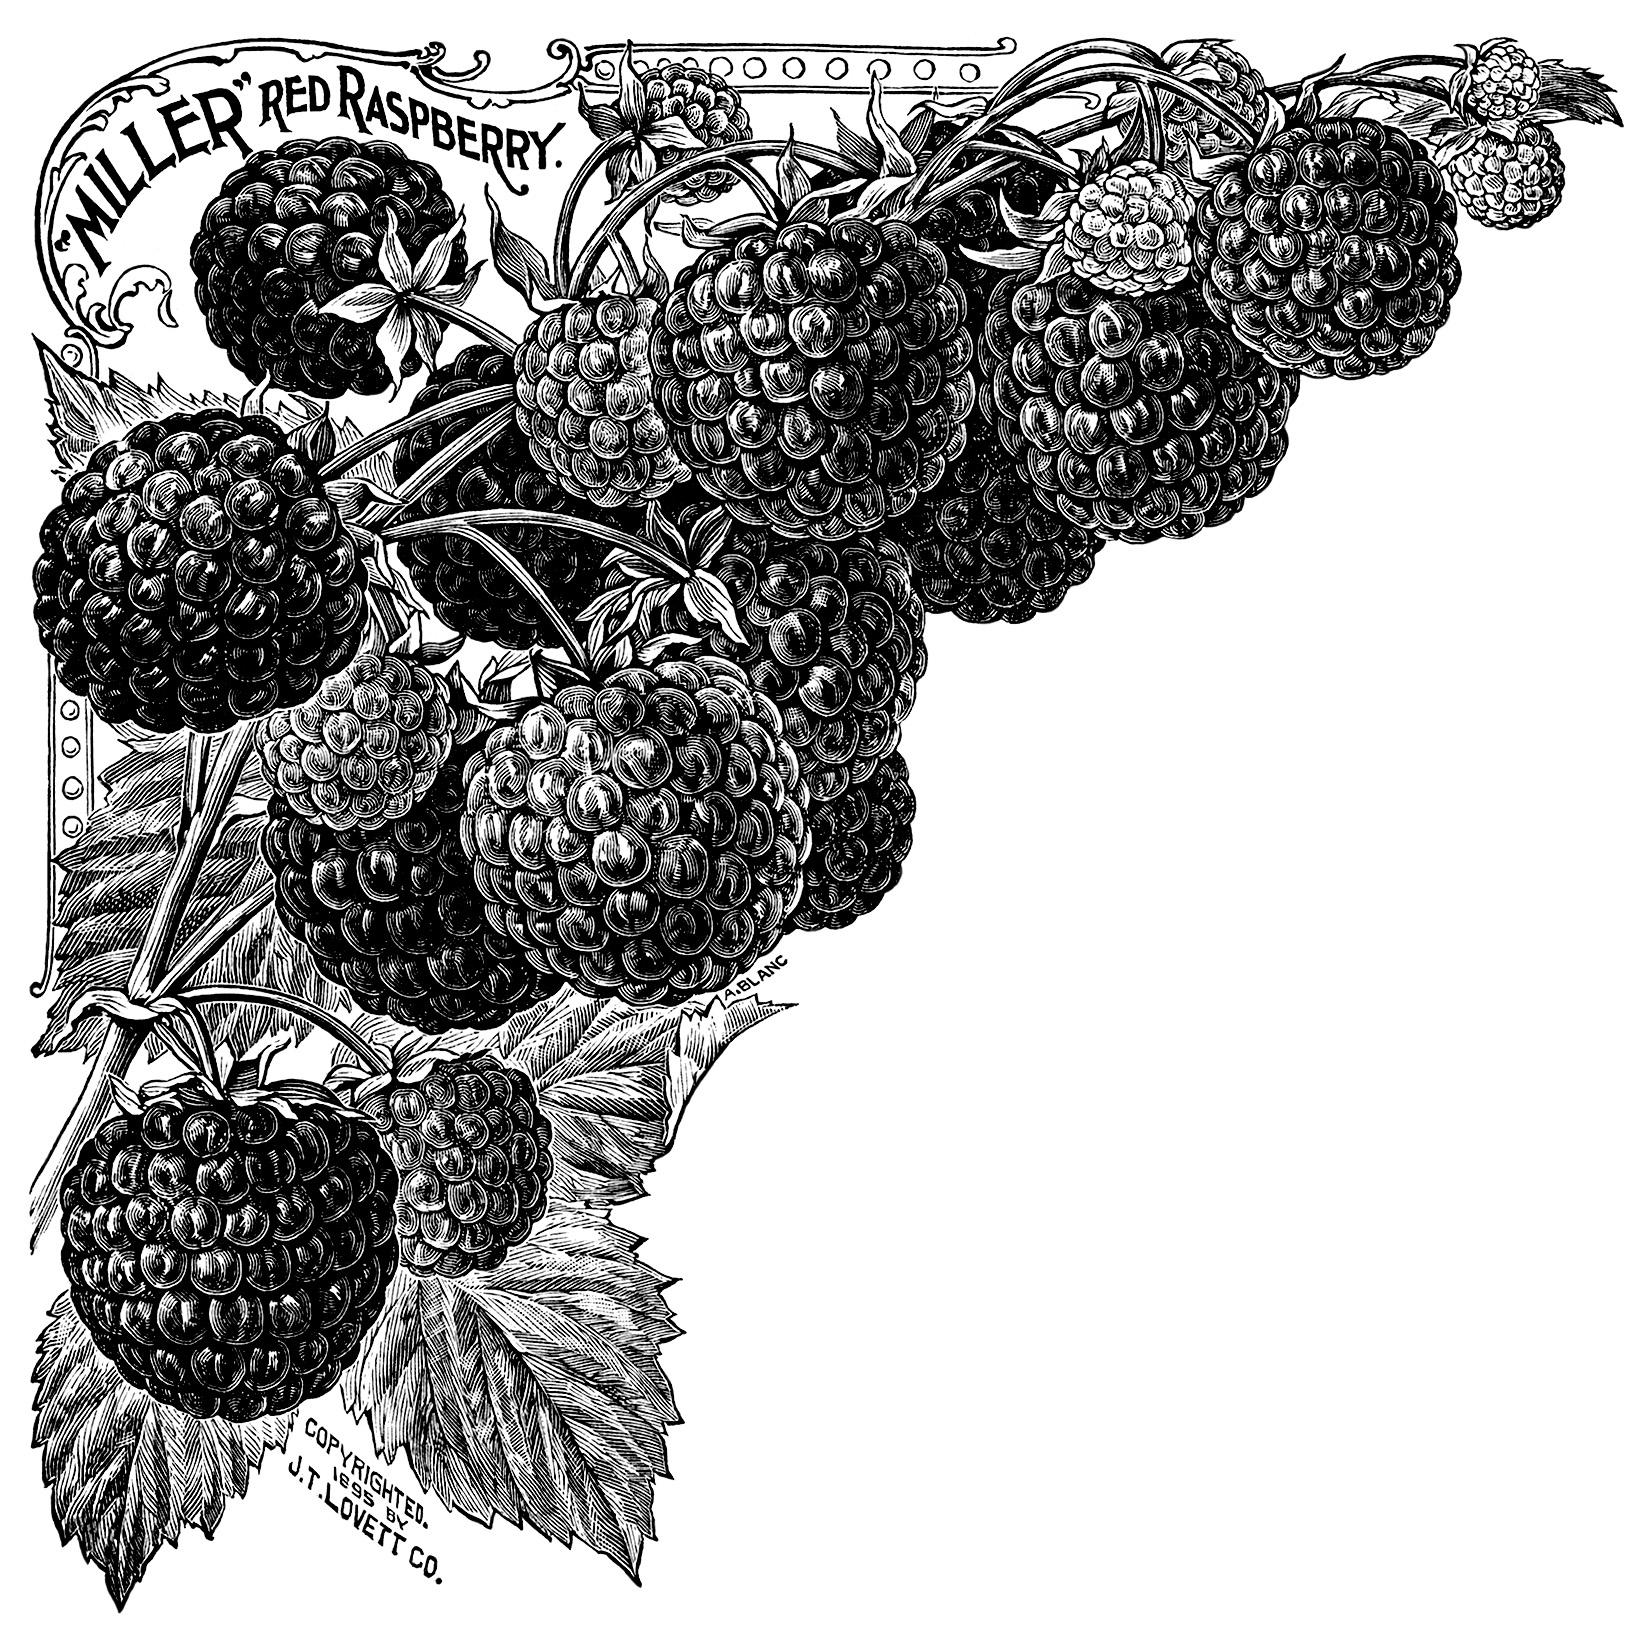 Raspberry Plant | Old Design Shop Blog